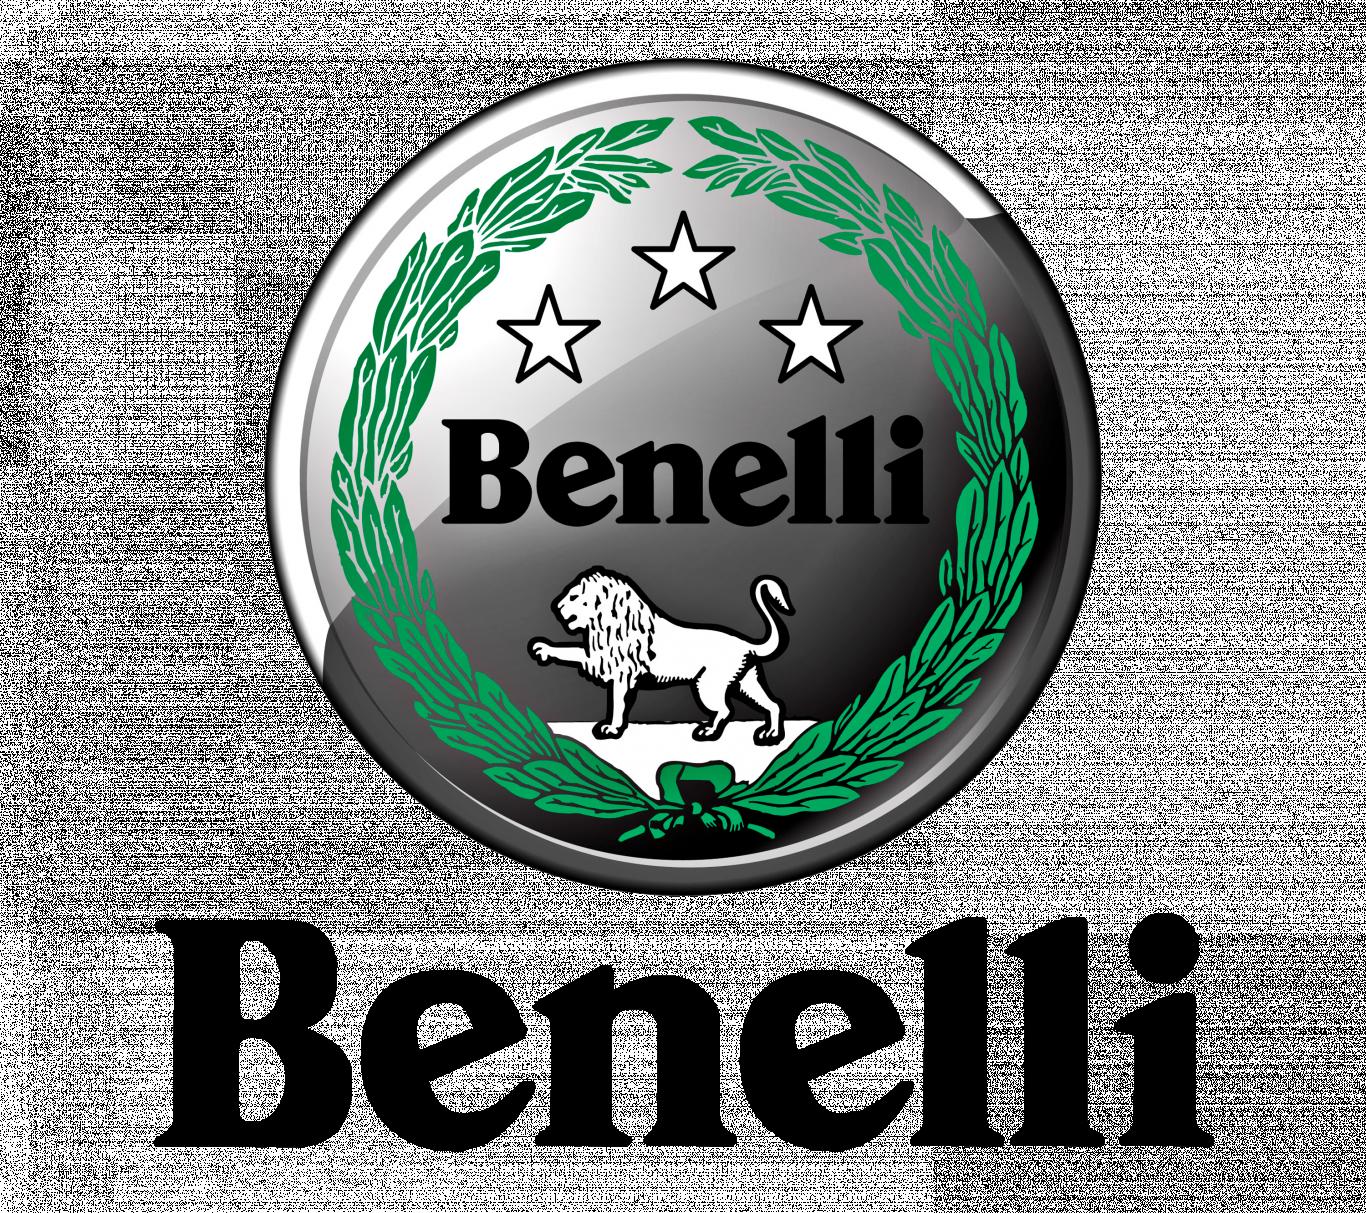 Xe Benelli | Giá xe máy & mô tô Benelli 2020 - xeoto.com.vn